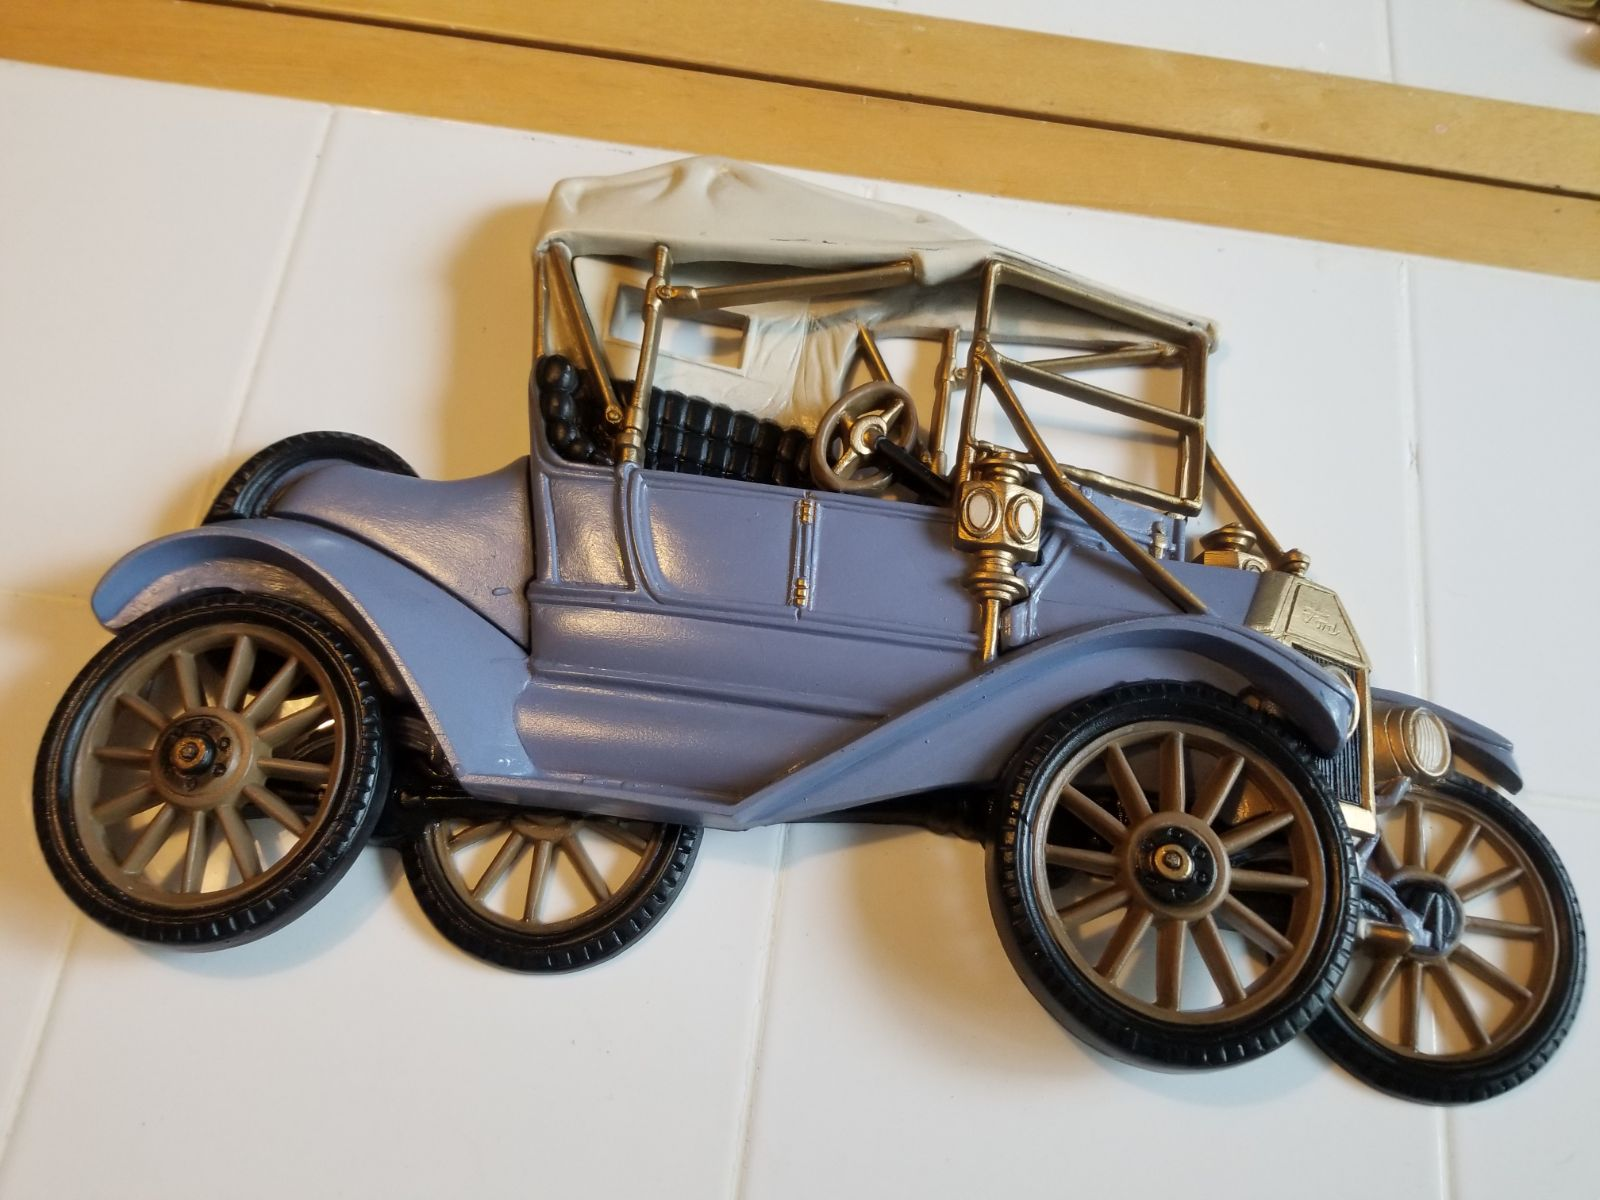 Mcm homco syroco old Ford car